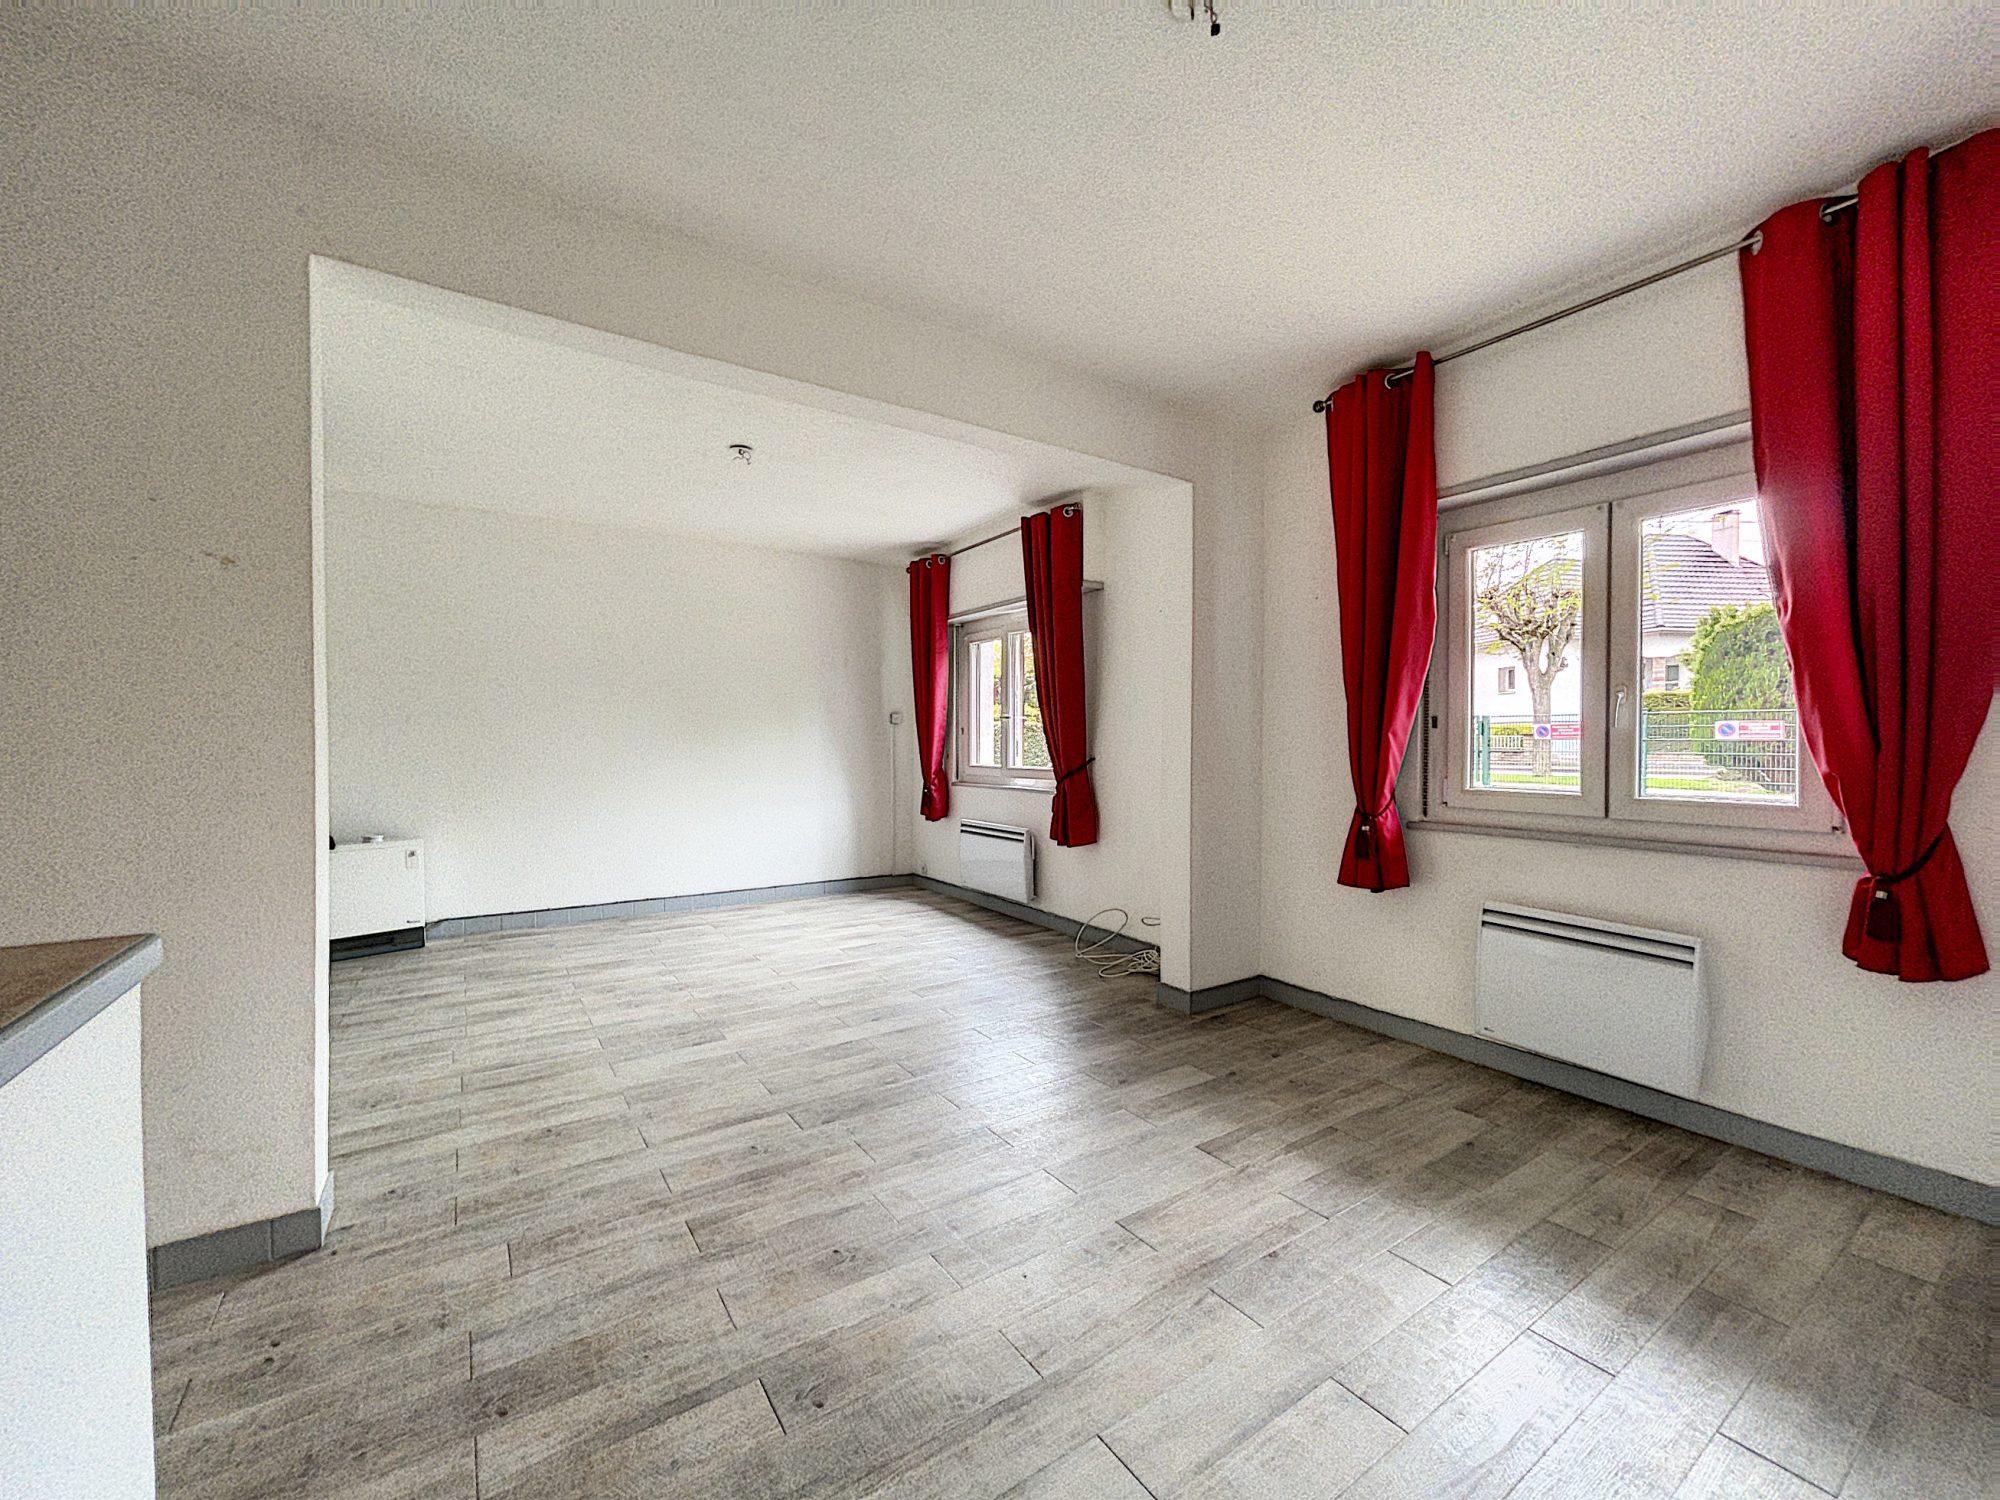 WOLFISHEIM - Appartement 2 pièces de 50,89m2